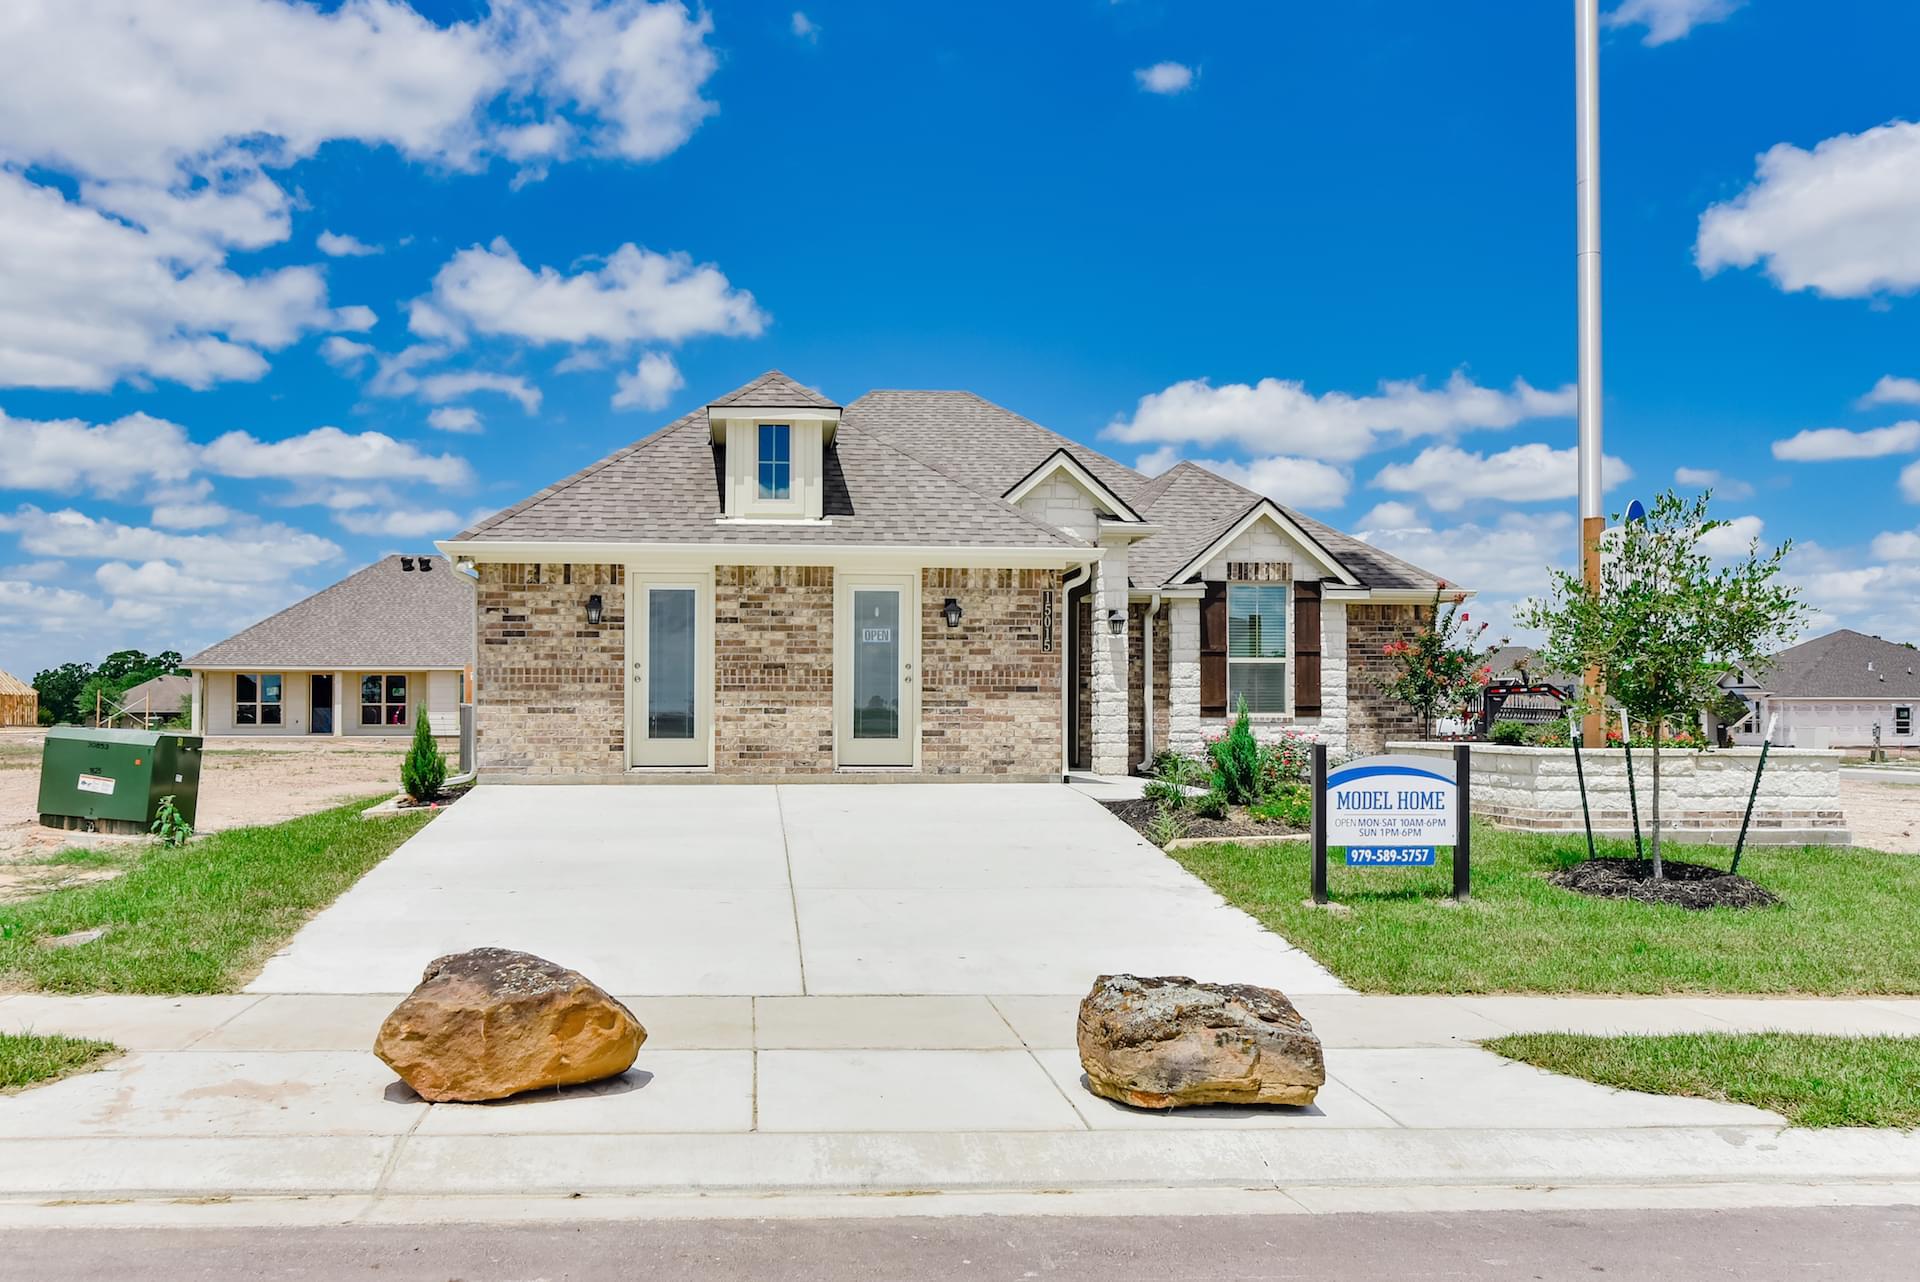 15015 Indian Creek Lane in College Station, TX